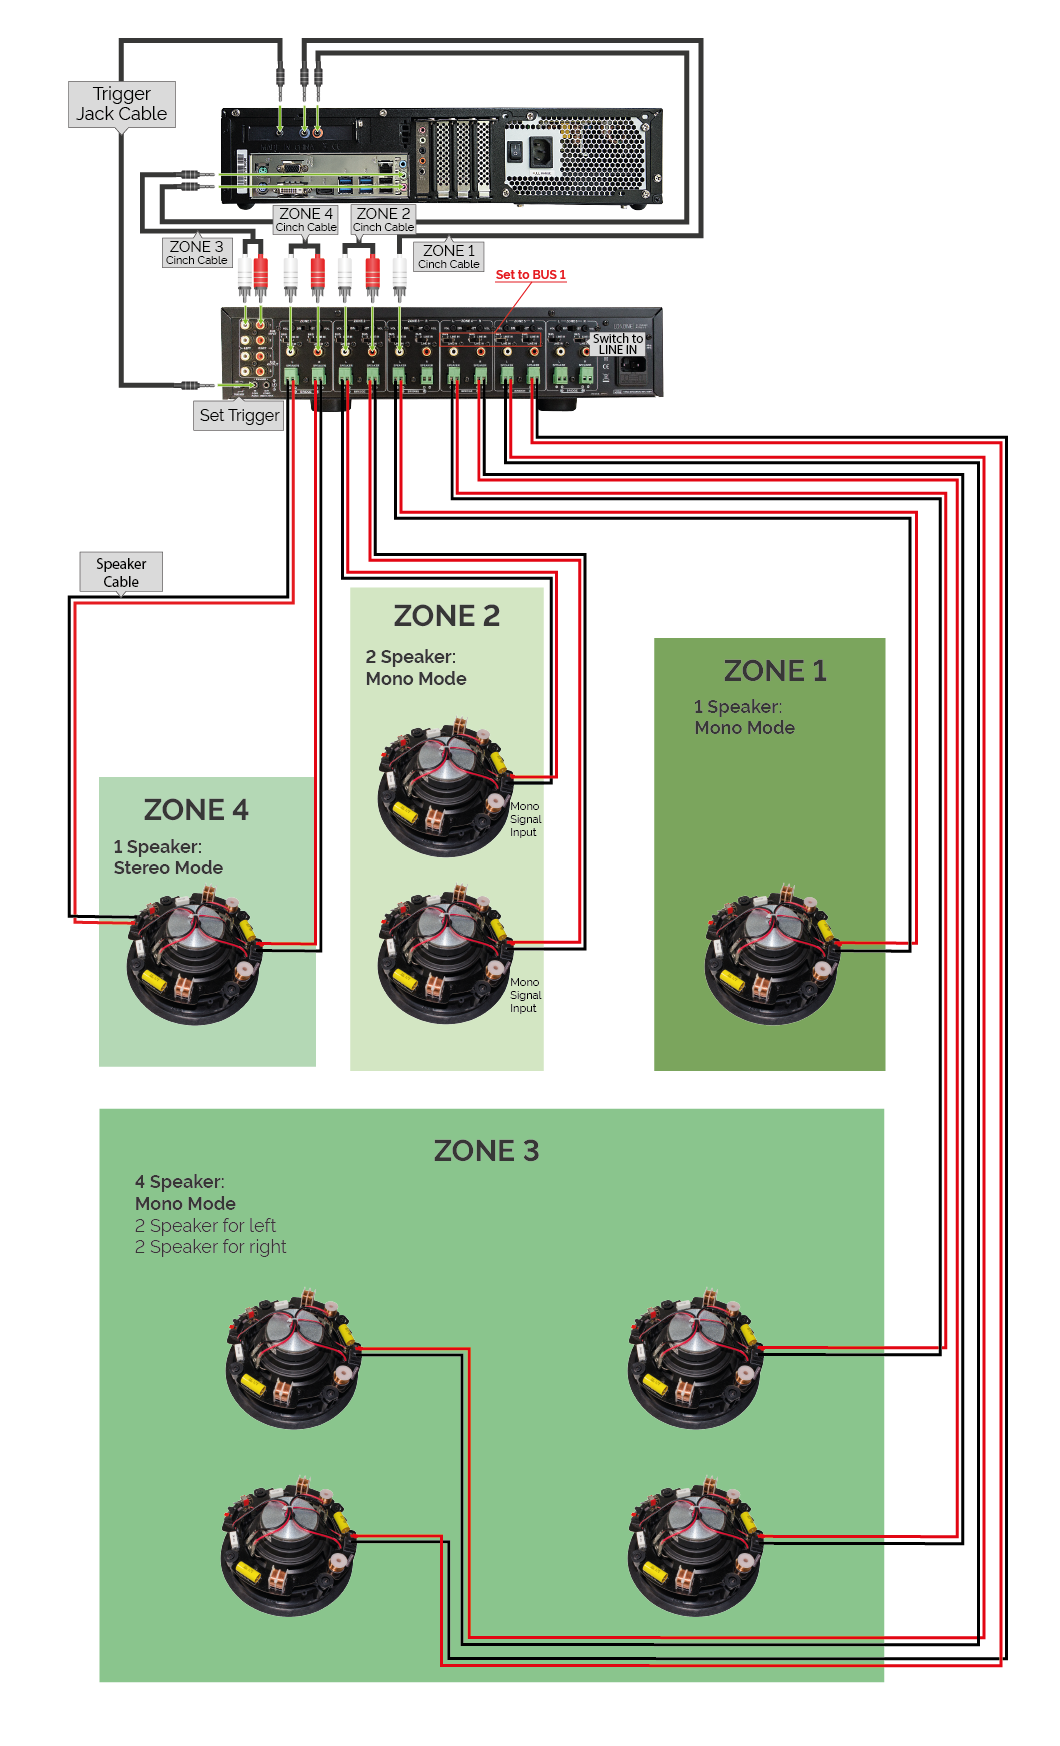 Loxone_Diagram_Musicserver_Wiring.png